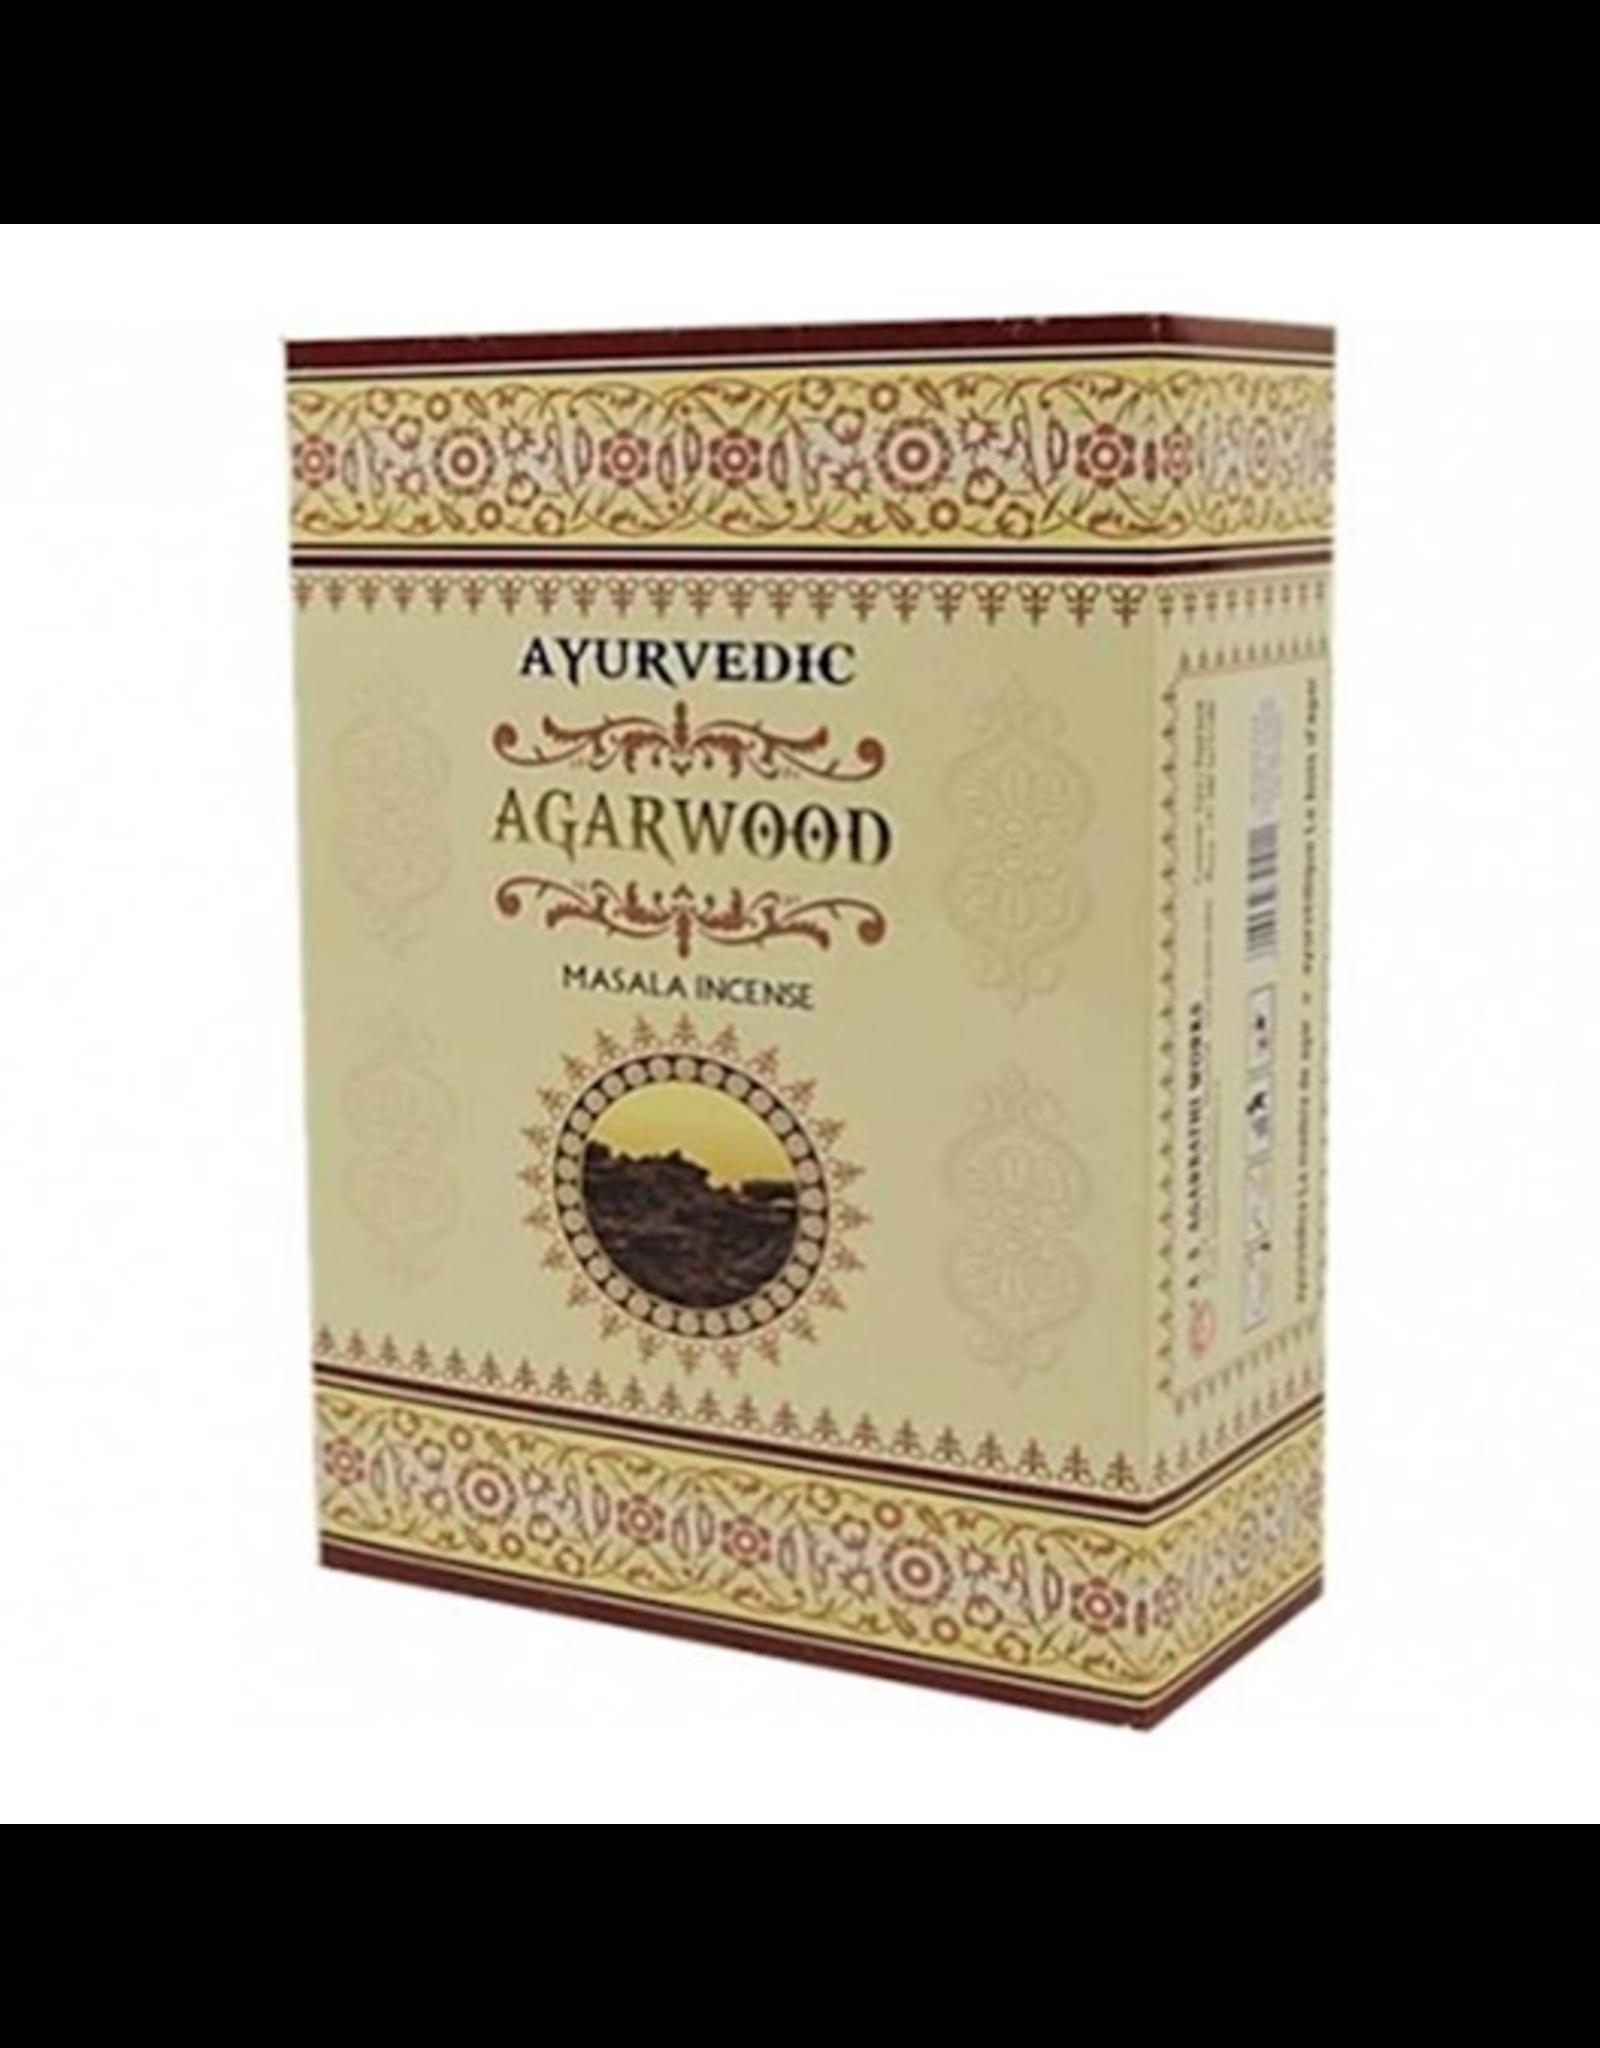 Ayurvedic Agarwood